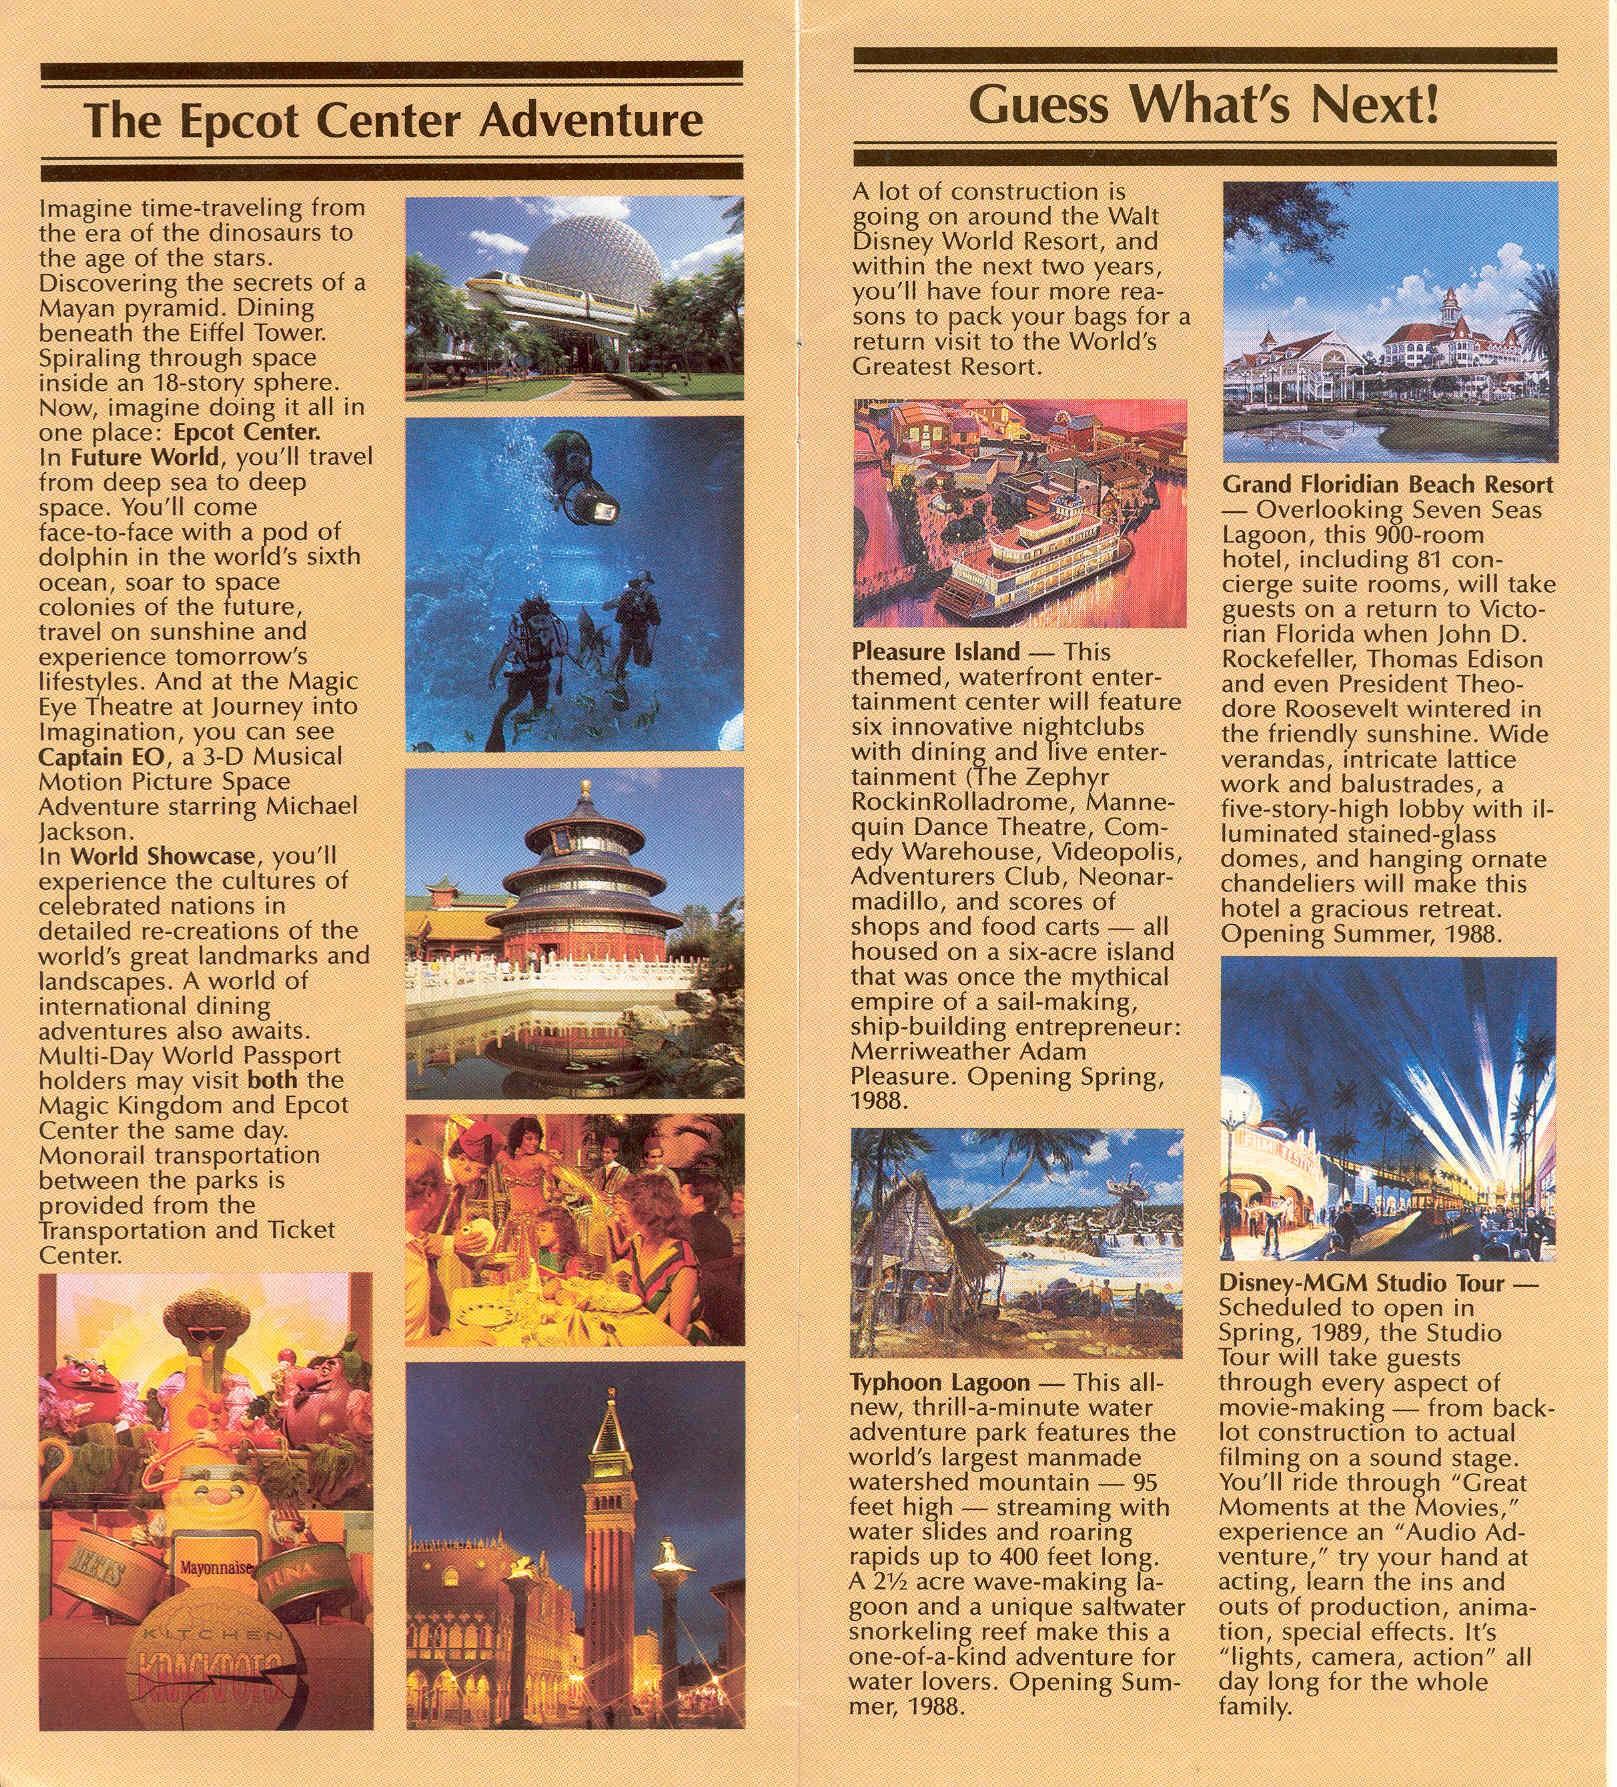 Magic Kingdom Guide Book 1986 - Photo 6 of 12